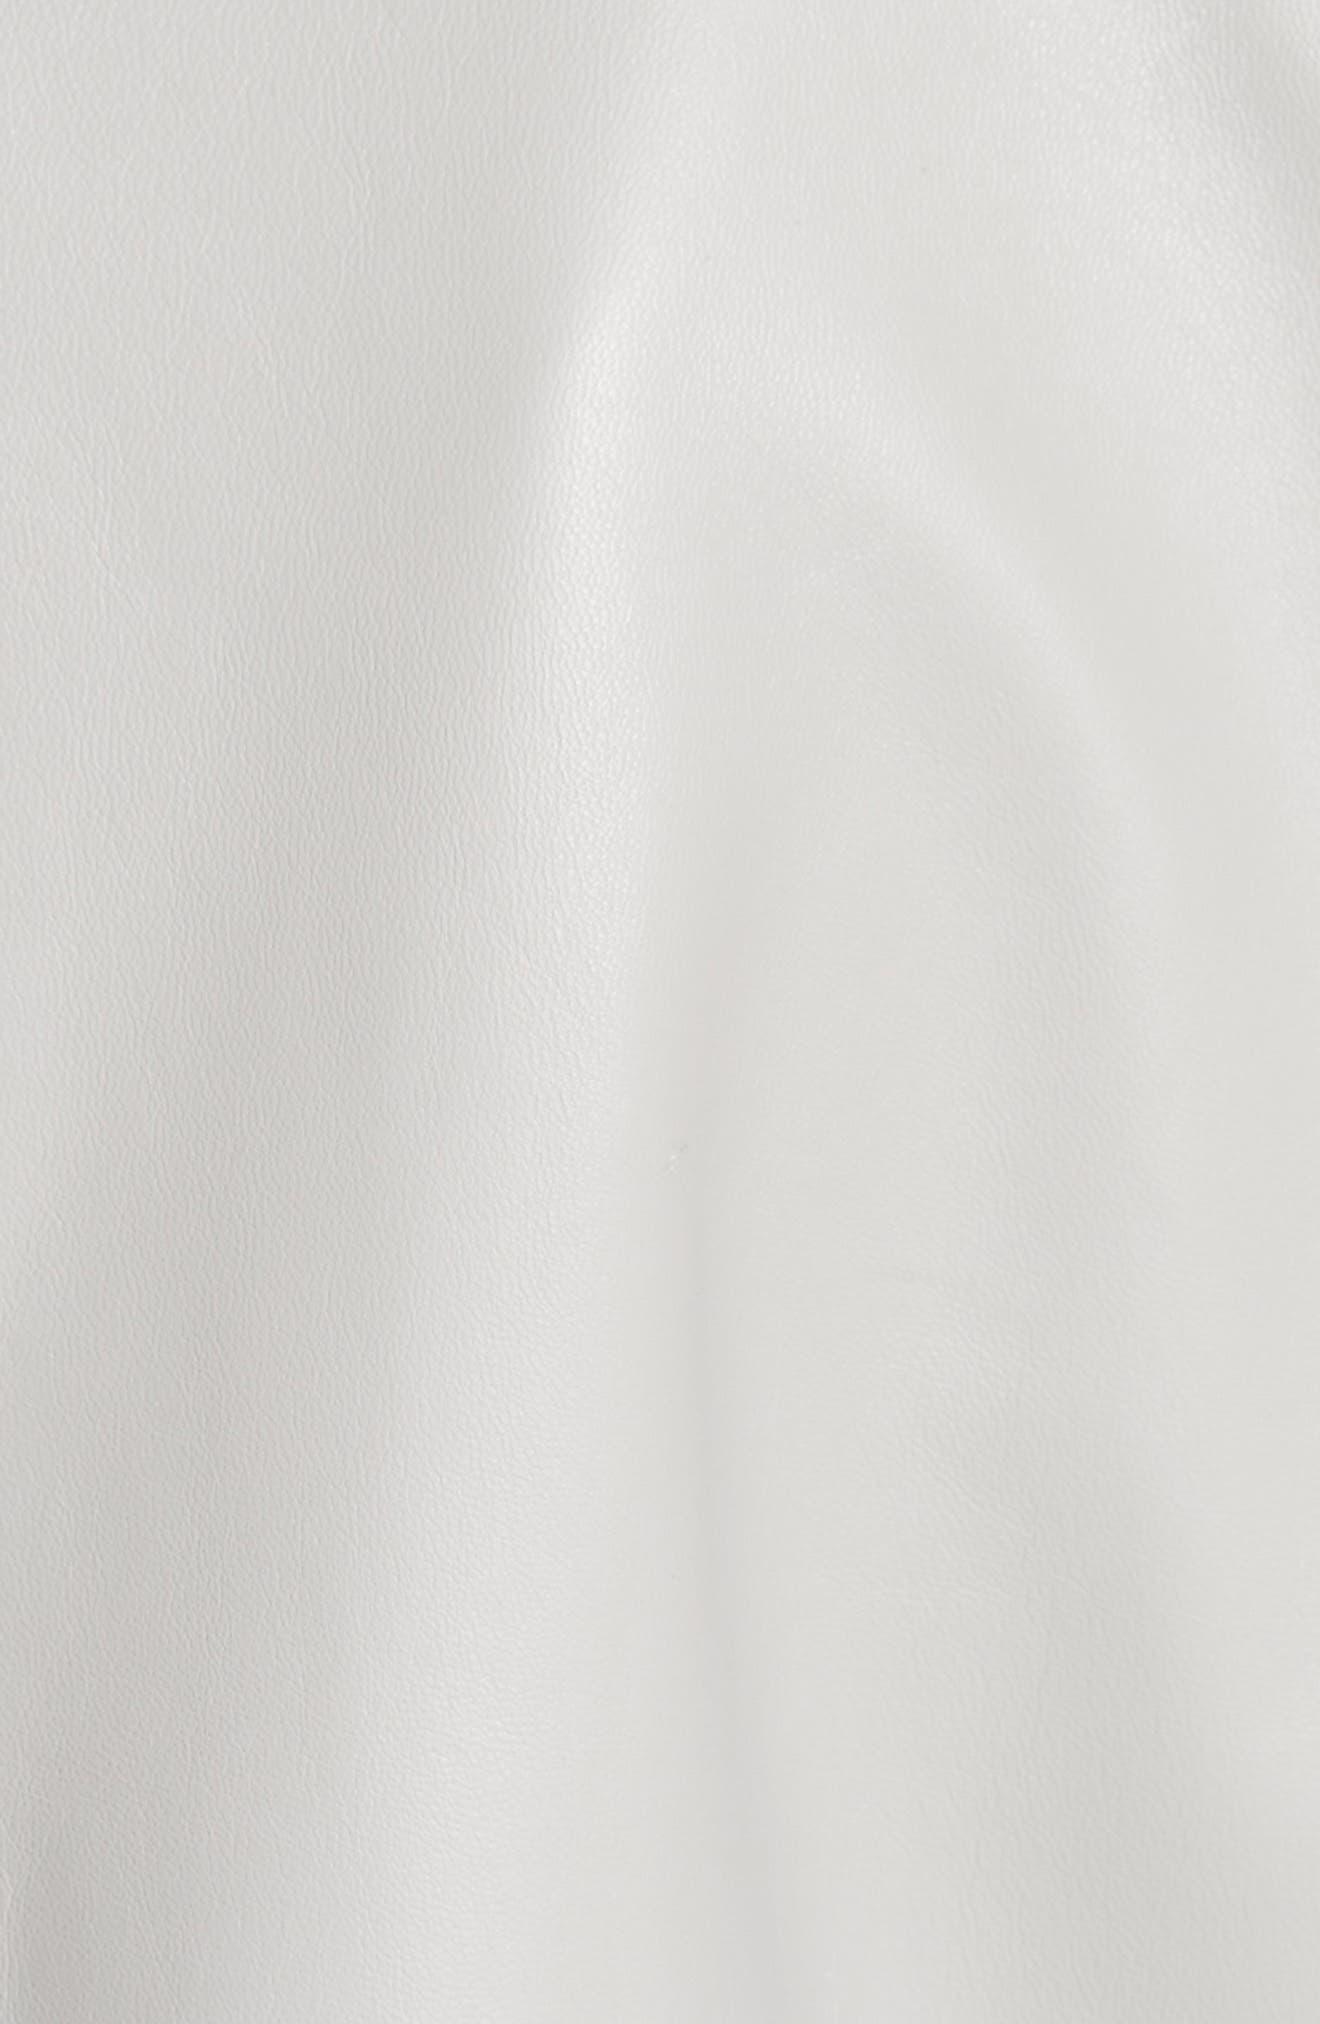 Studded Nappa Leather Jacket,                             Alternate thumbnail 5, color,                             Grey